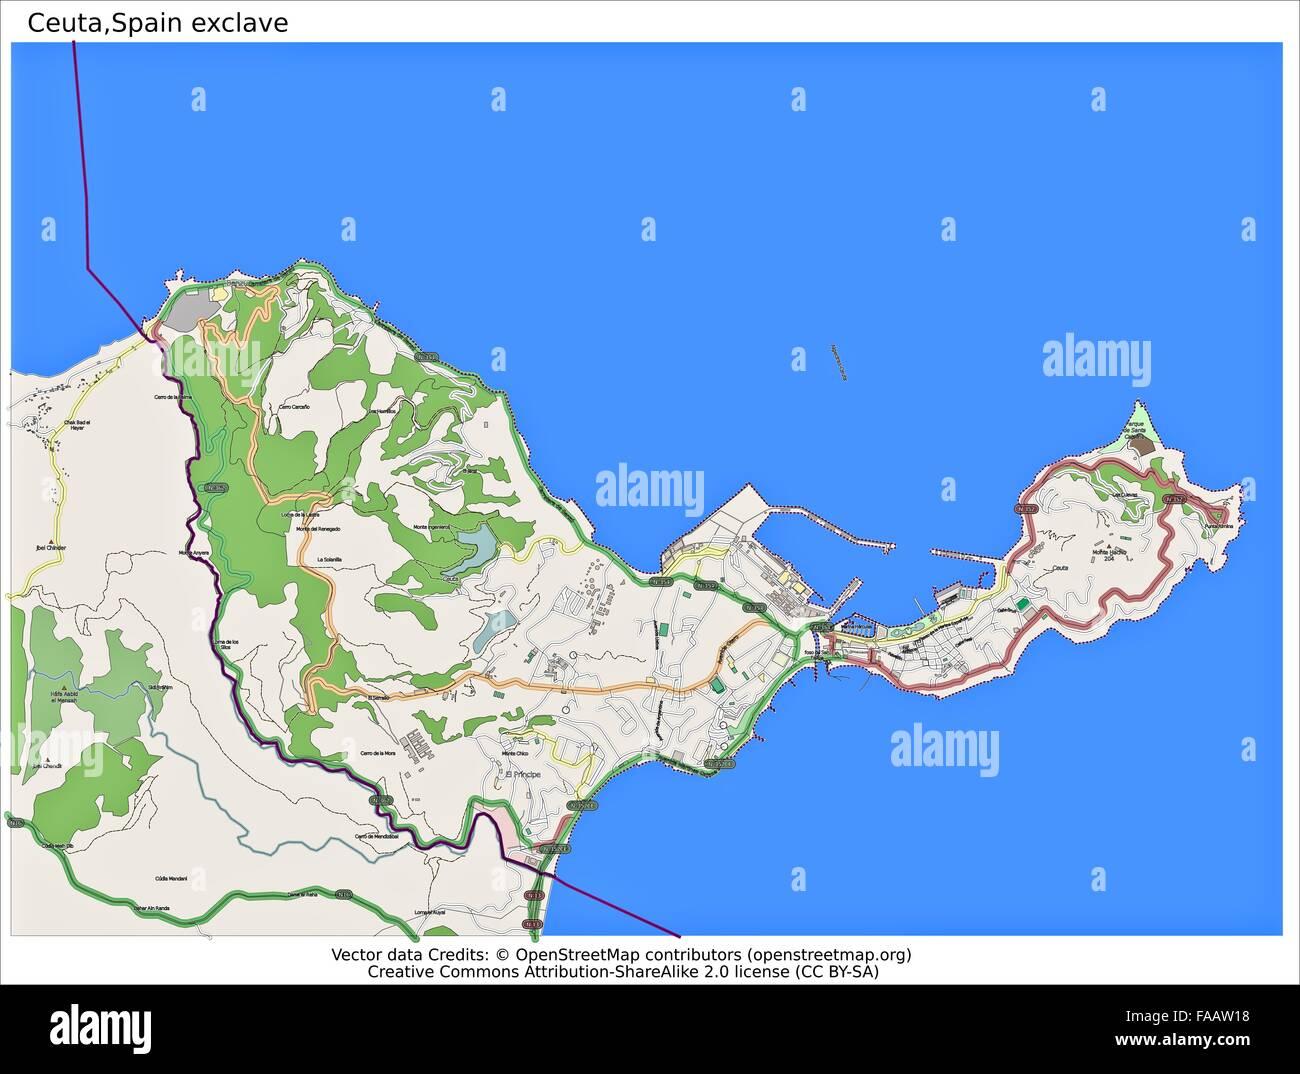 Ceuta Spain map Stock Photo: 92437556 - Alamy on